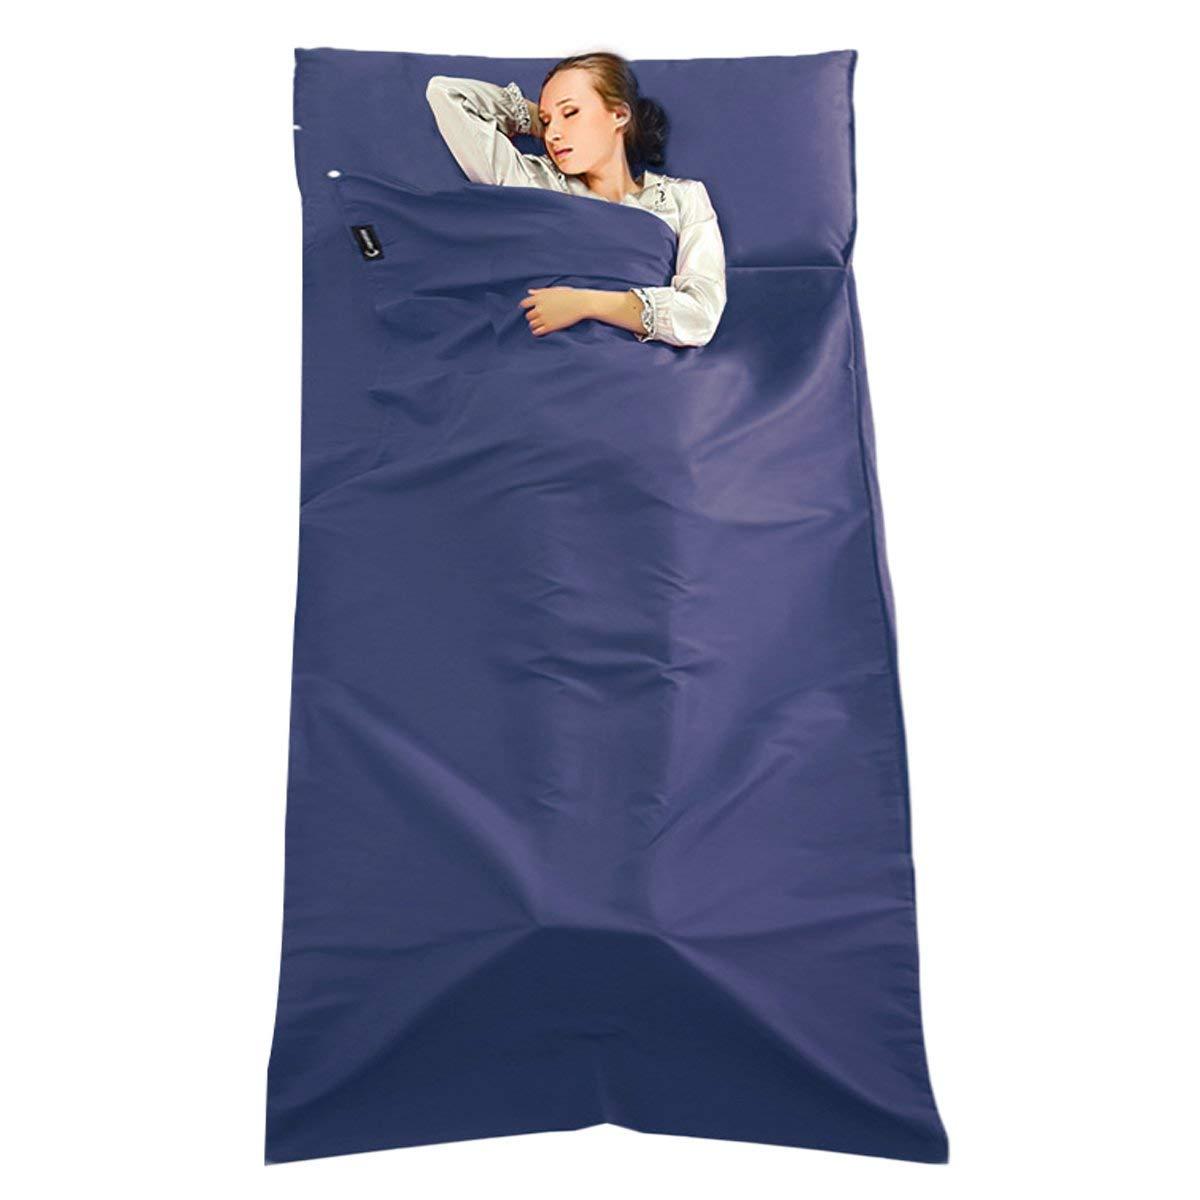 TRIWONDER Sleeping Bag Liner Camping Sheet Travel Sheet Cotton Lightweight Sleeping Sack for Camping Hotels /& Backpacking Traveling